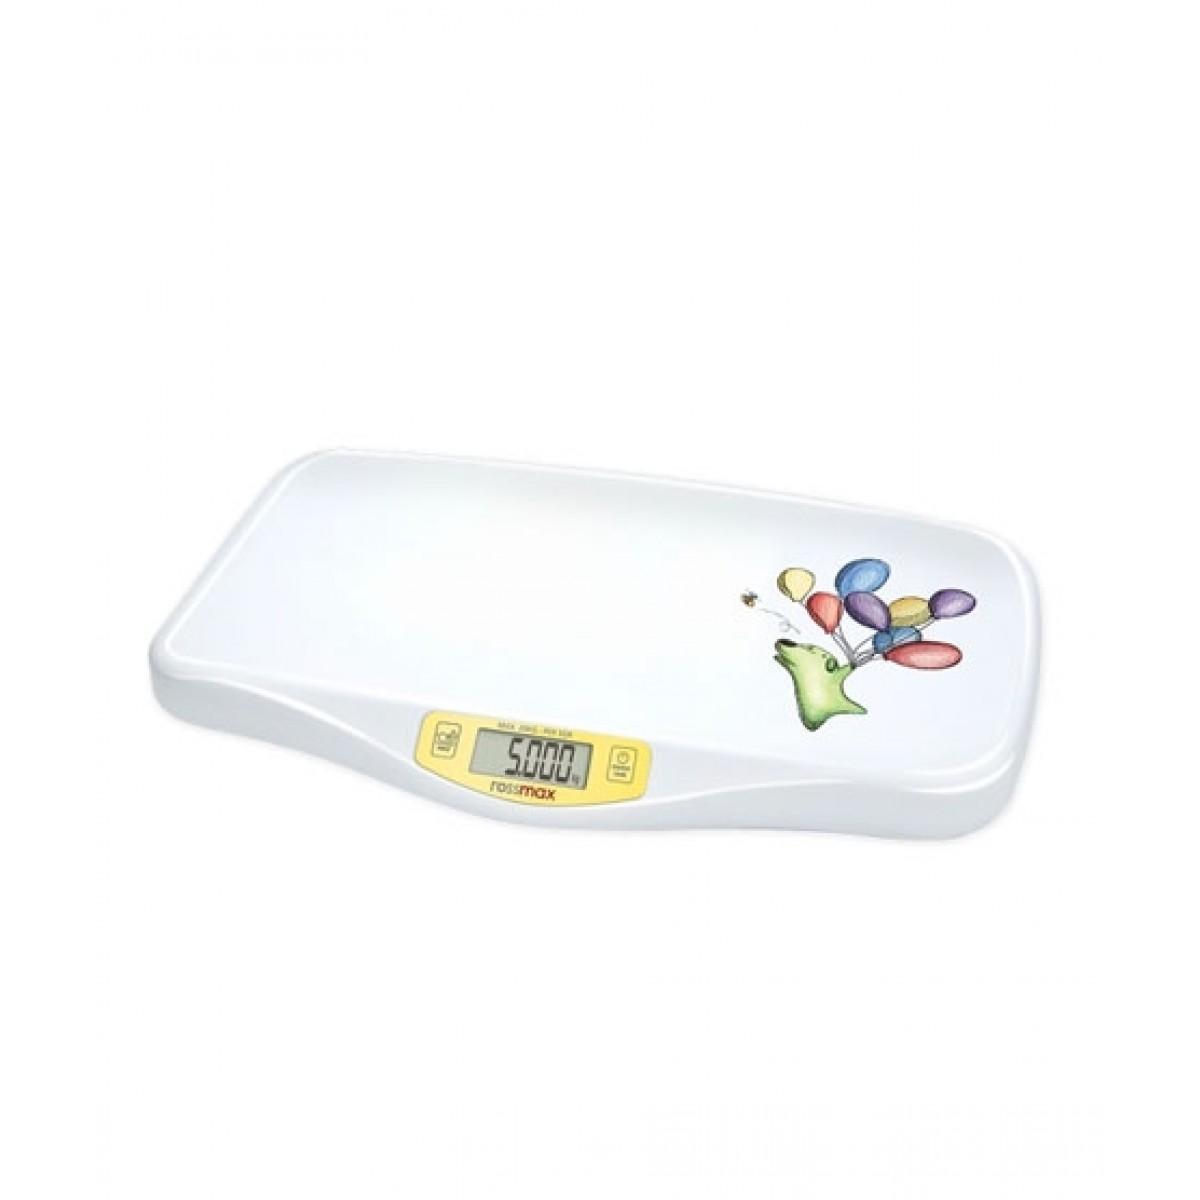 Rossmax Digital Baby Scale (WE300)